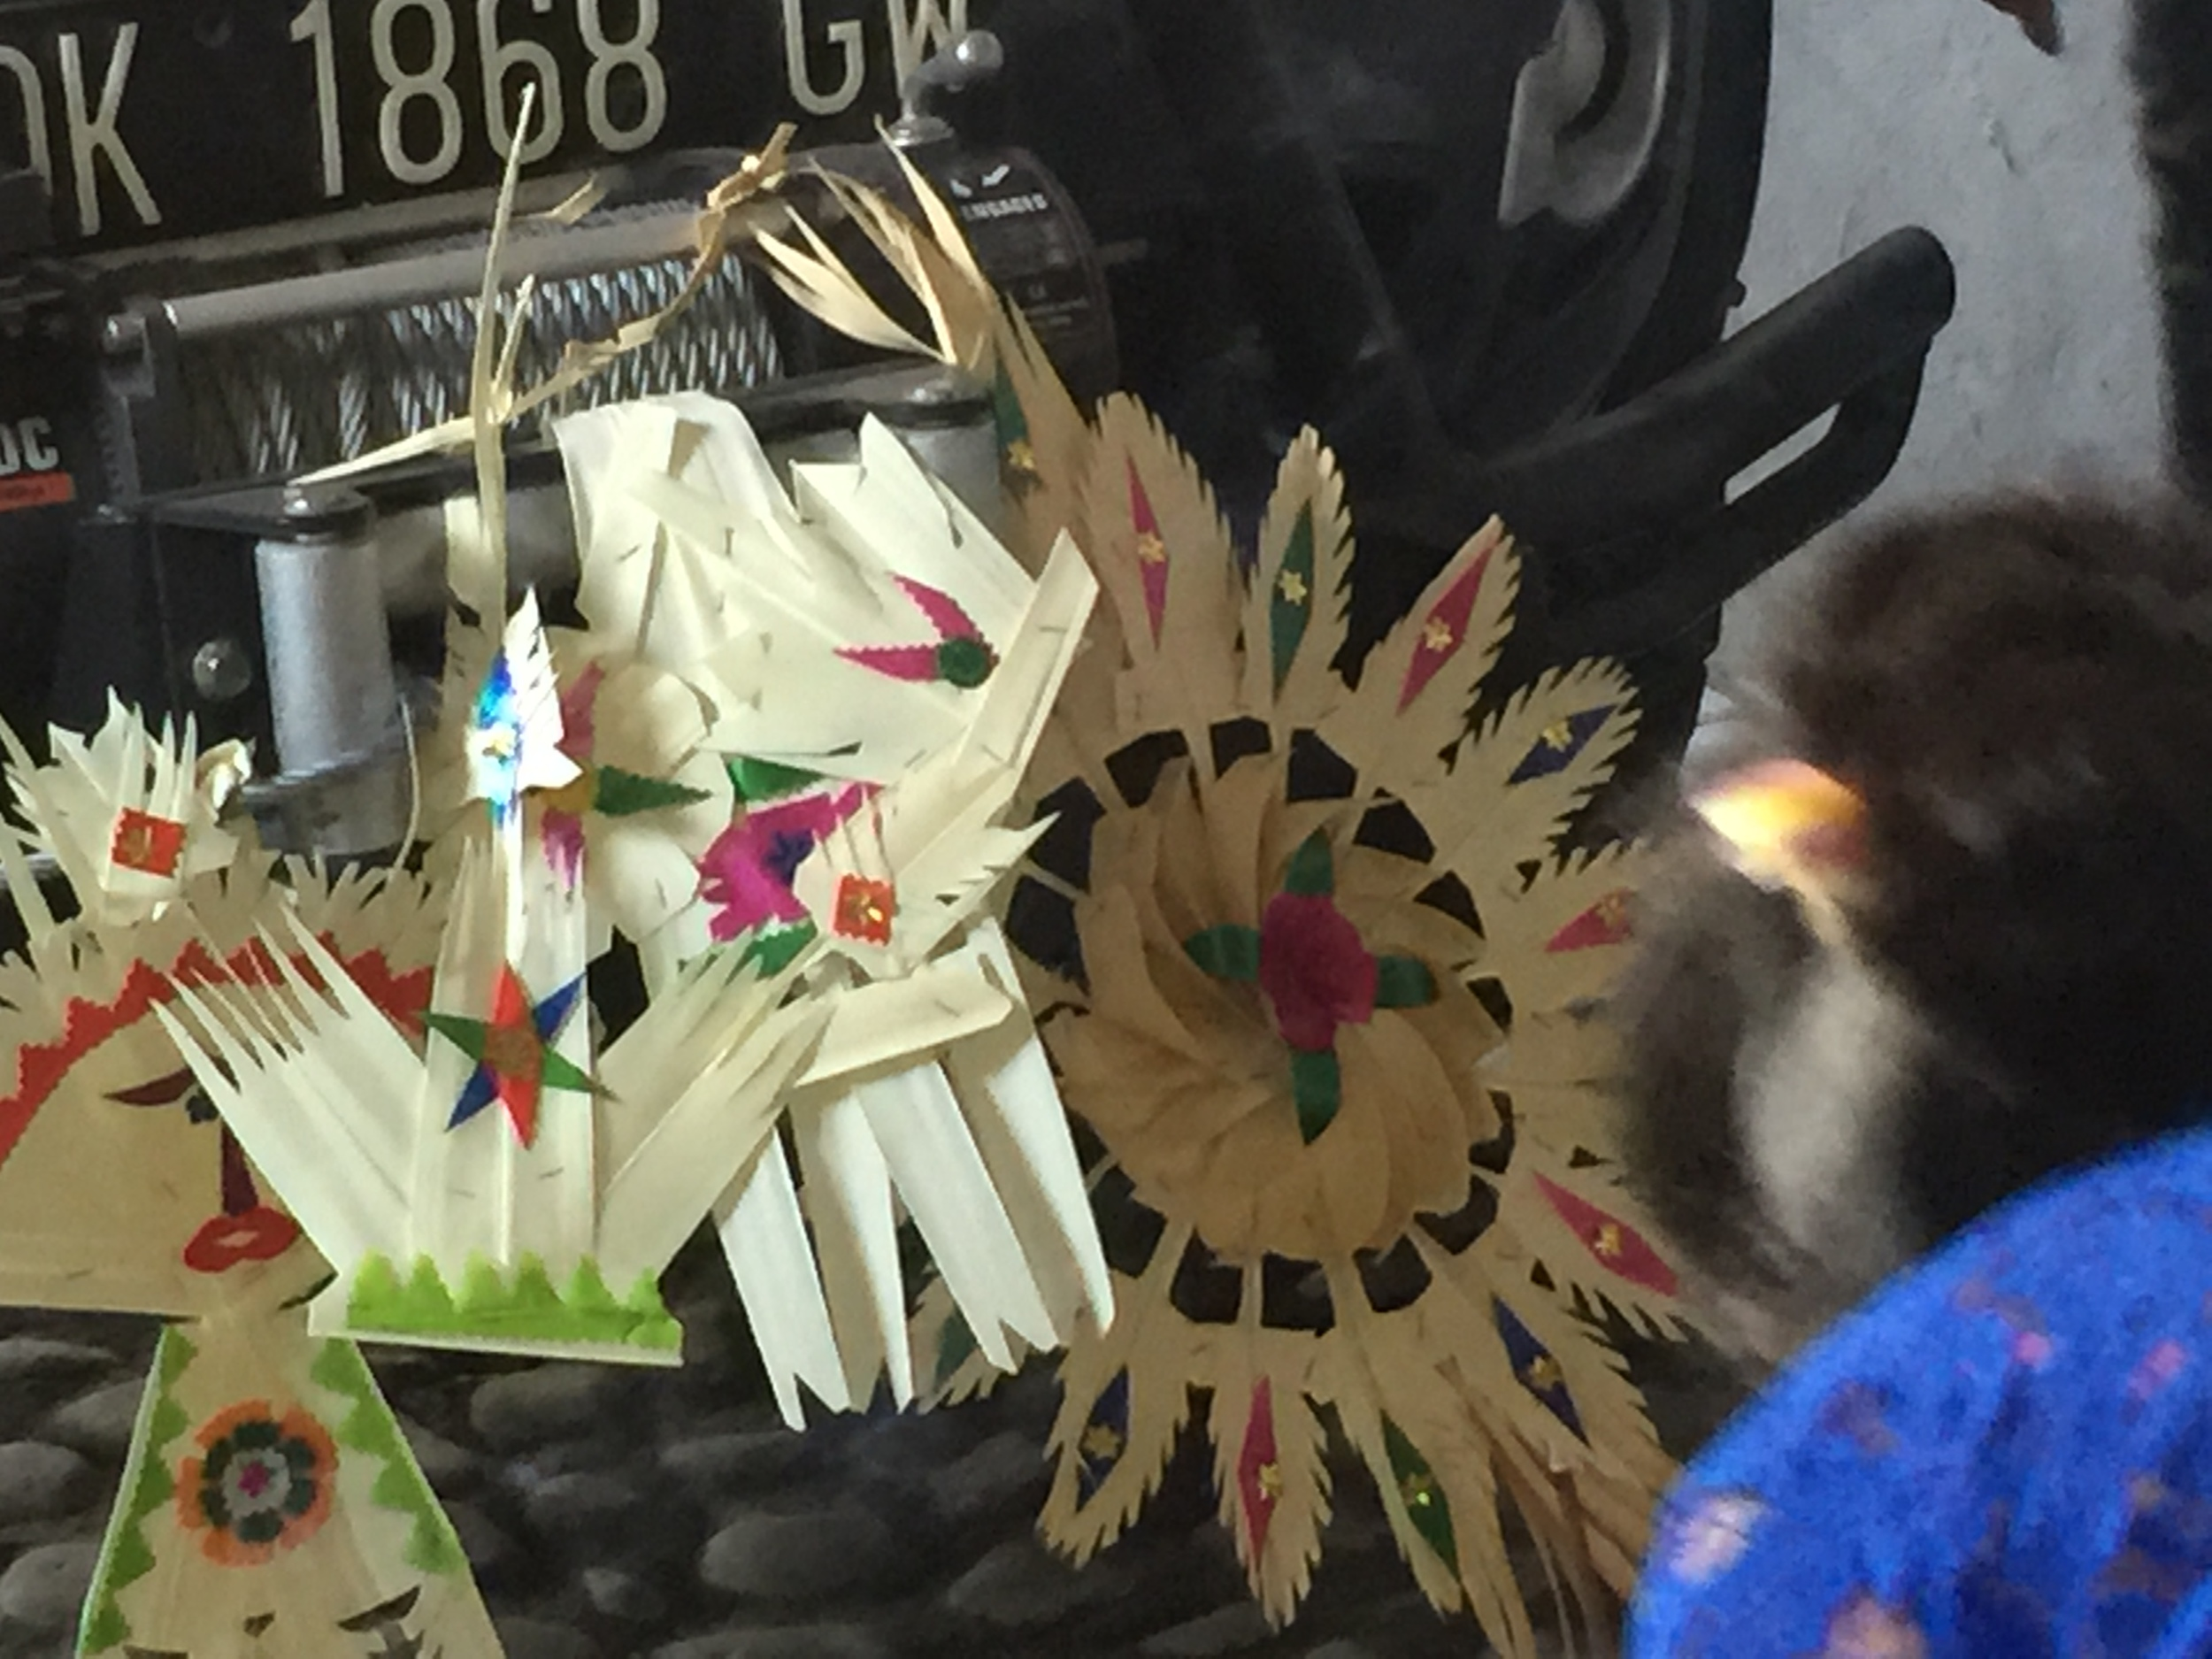 balinese ceremony at Jiwa DAmai